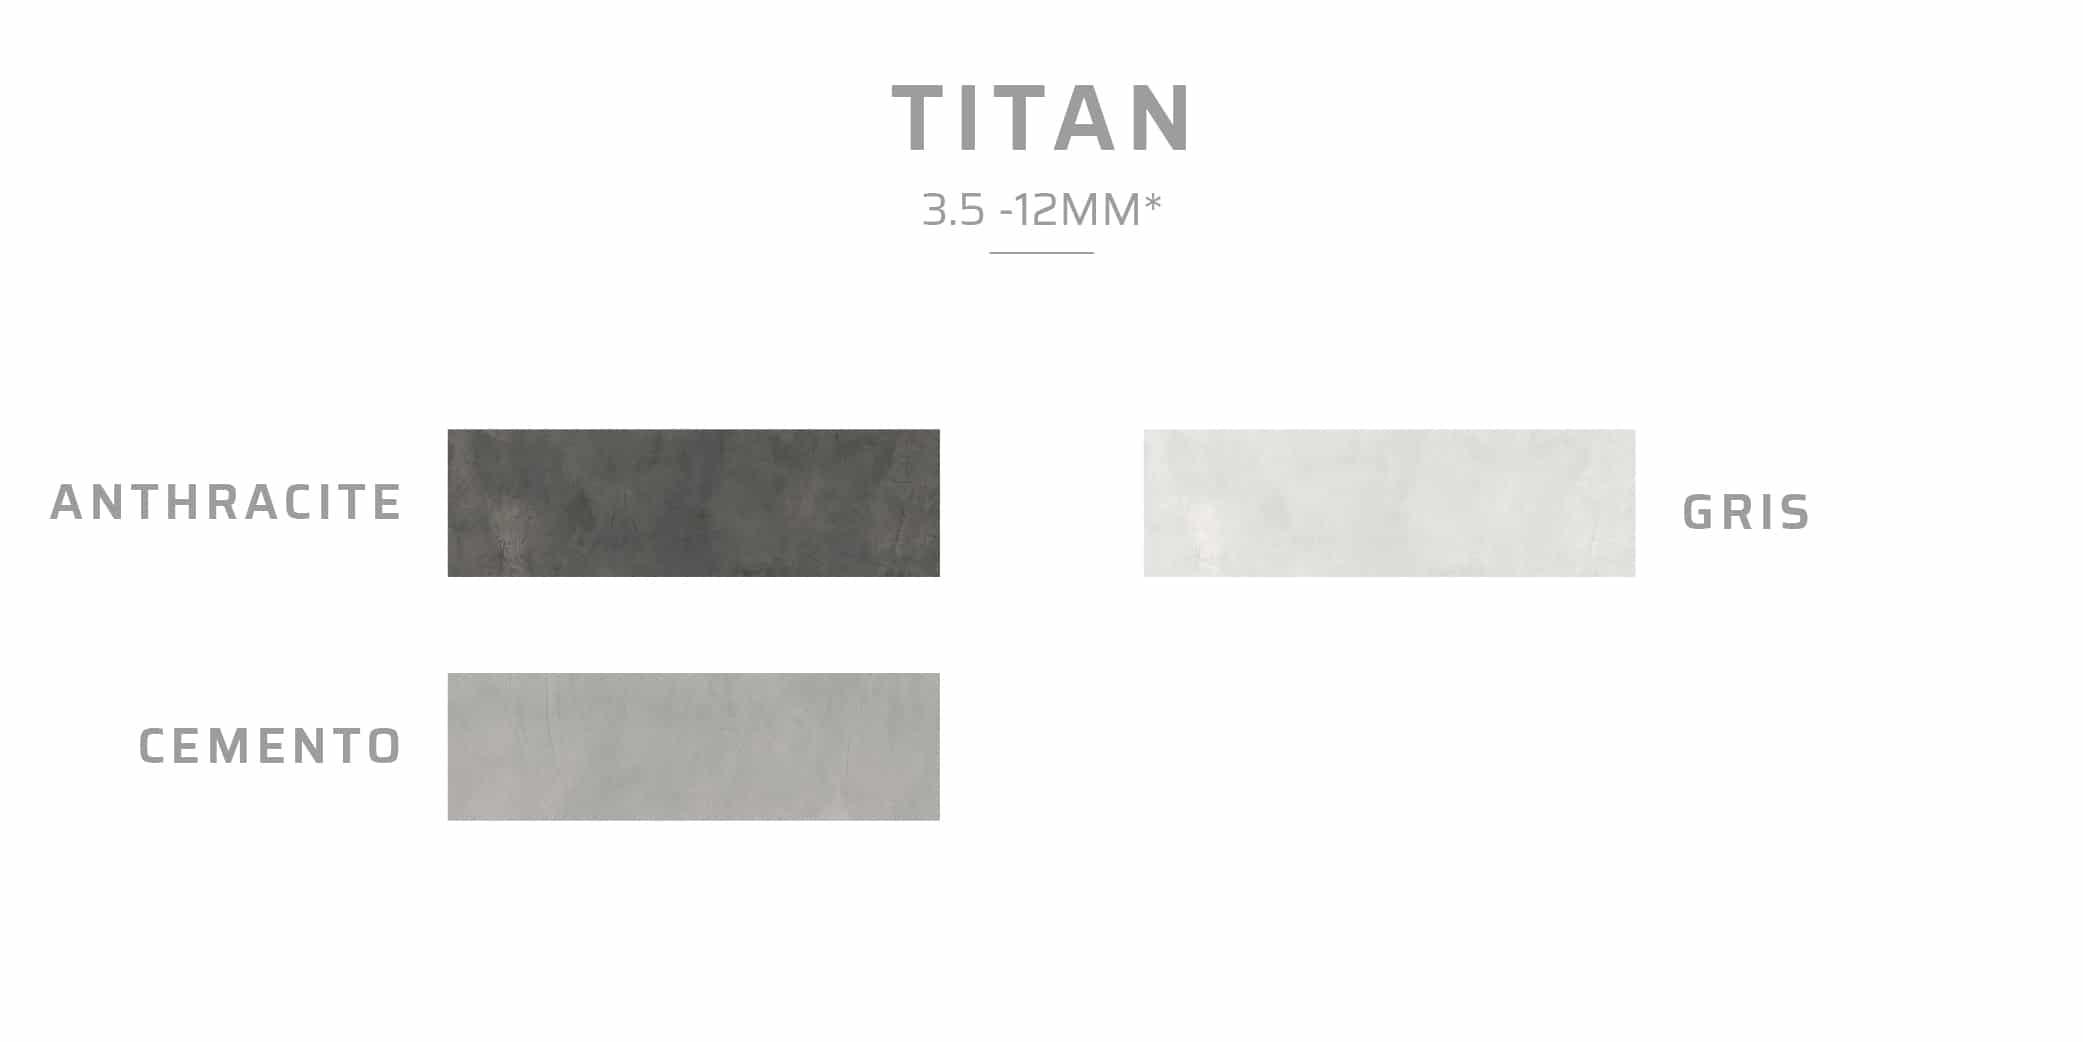 porcelain cladding titan